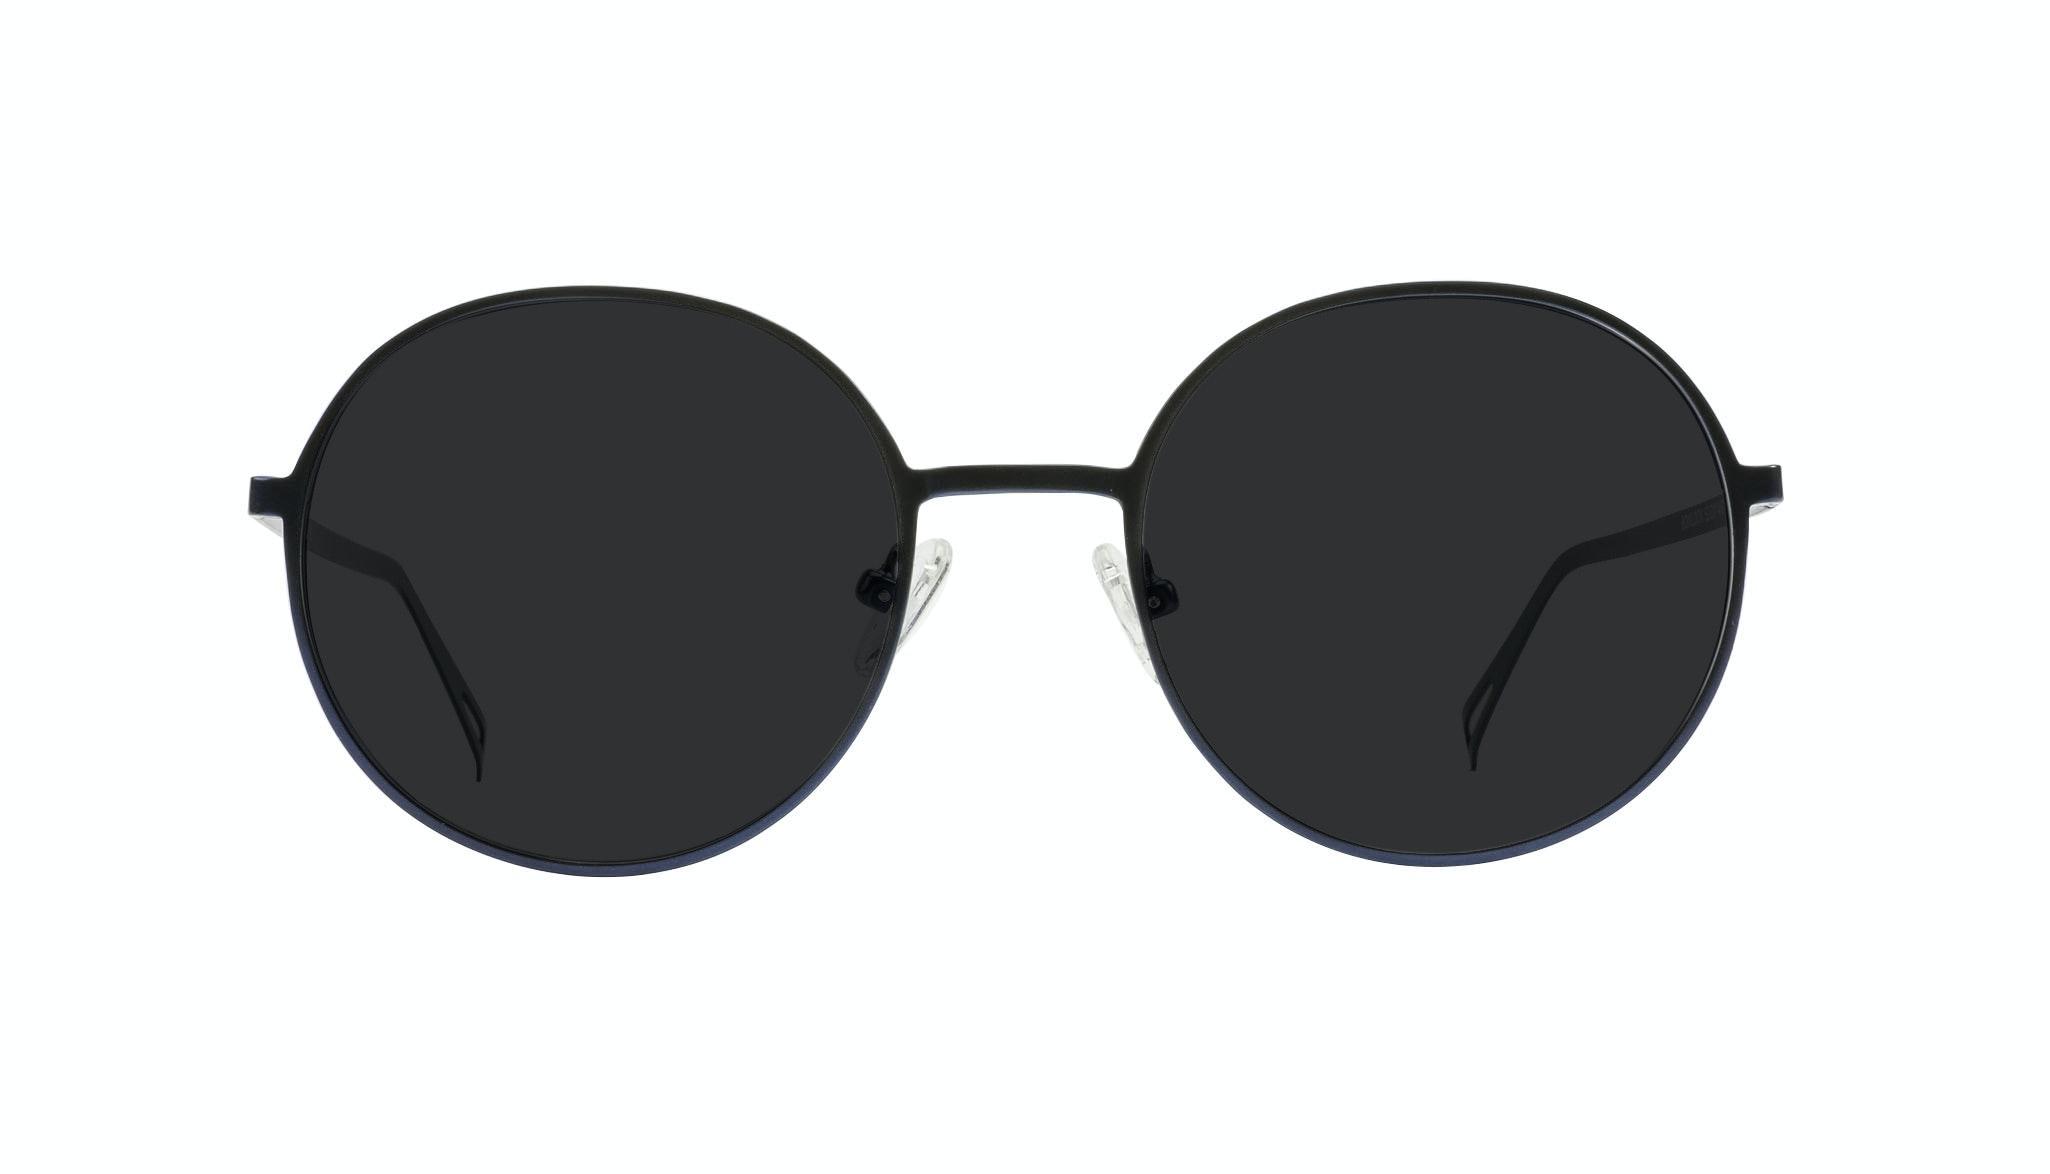 Affordable Fashion Glasses Round Sunglasses Men Women Varna Navy Front